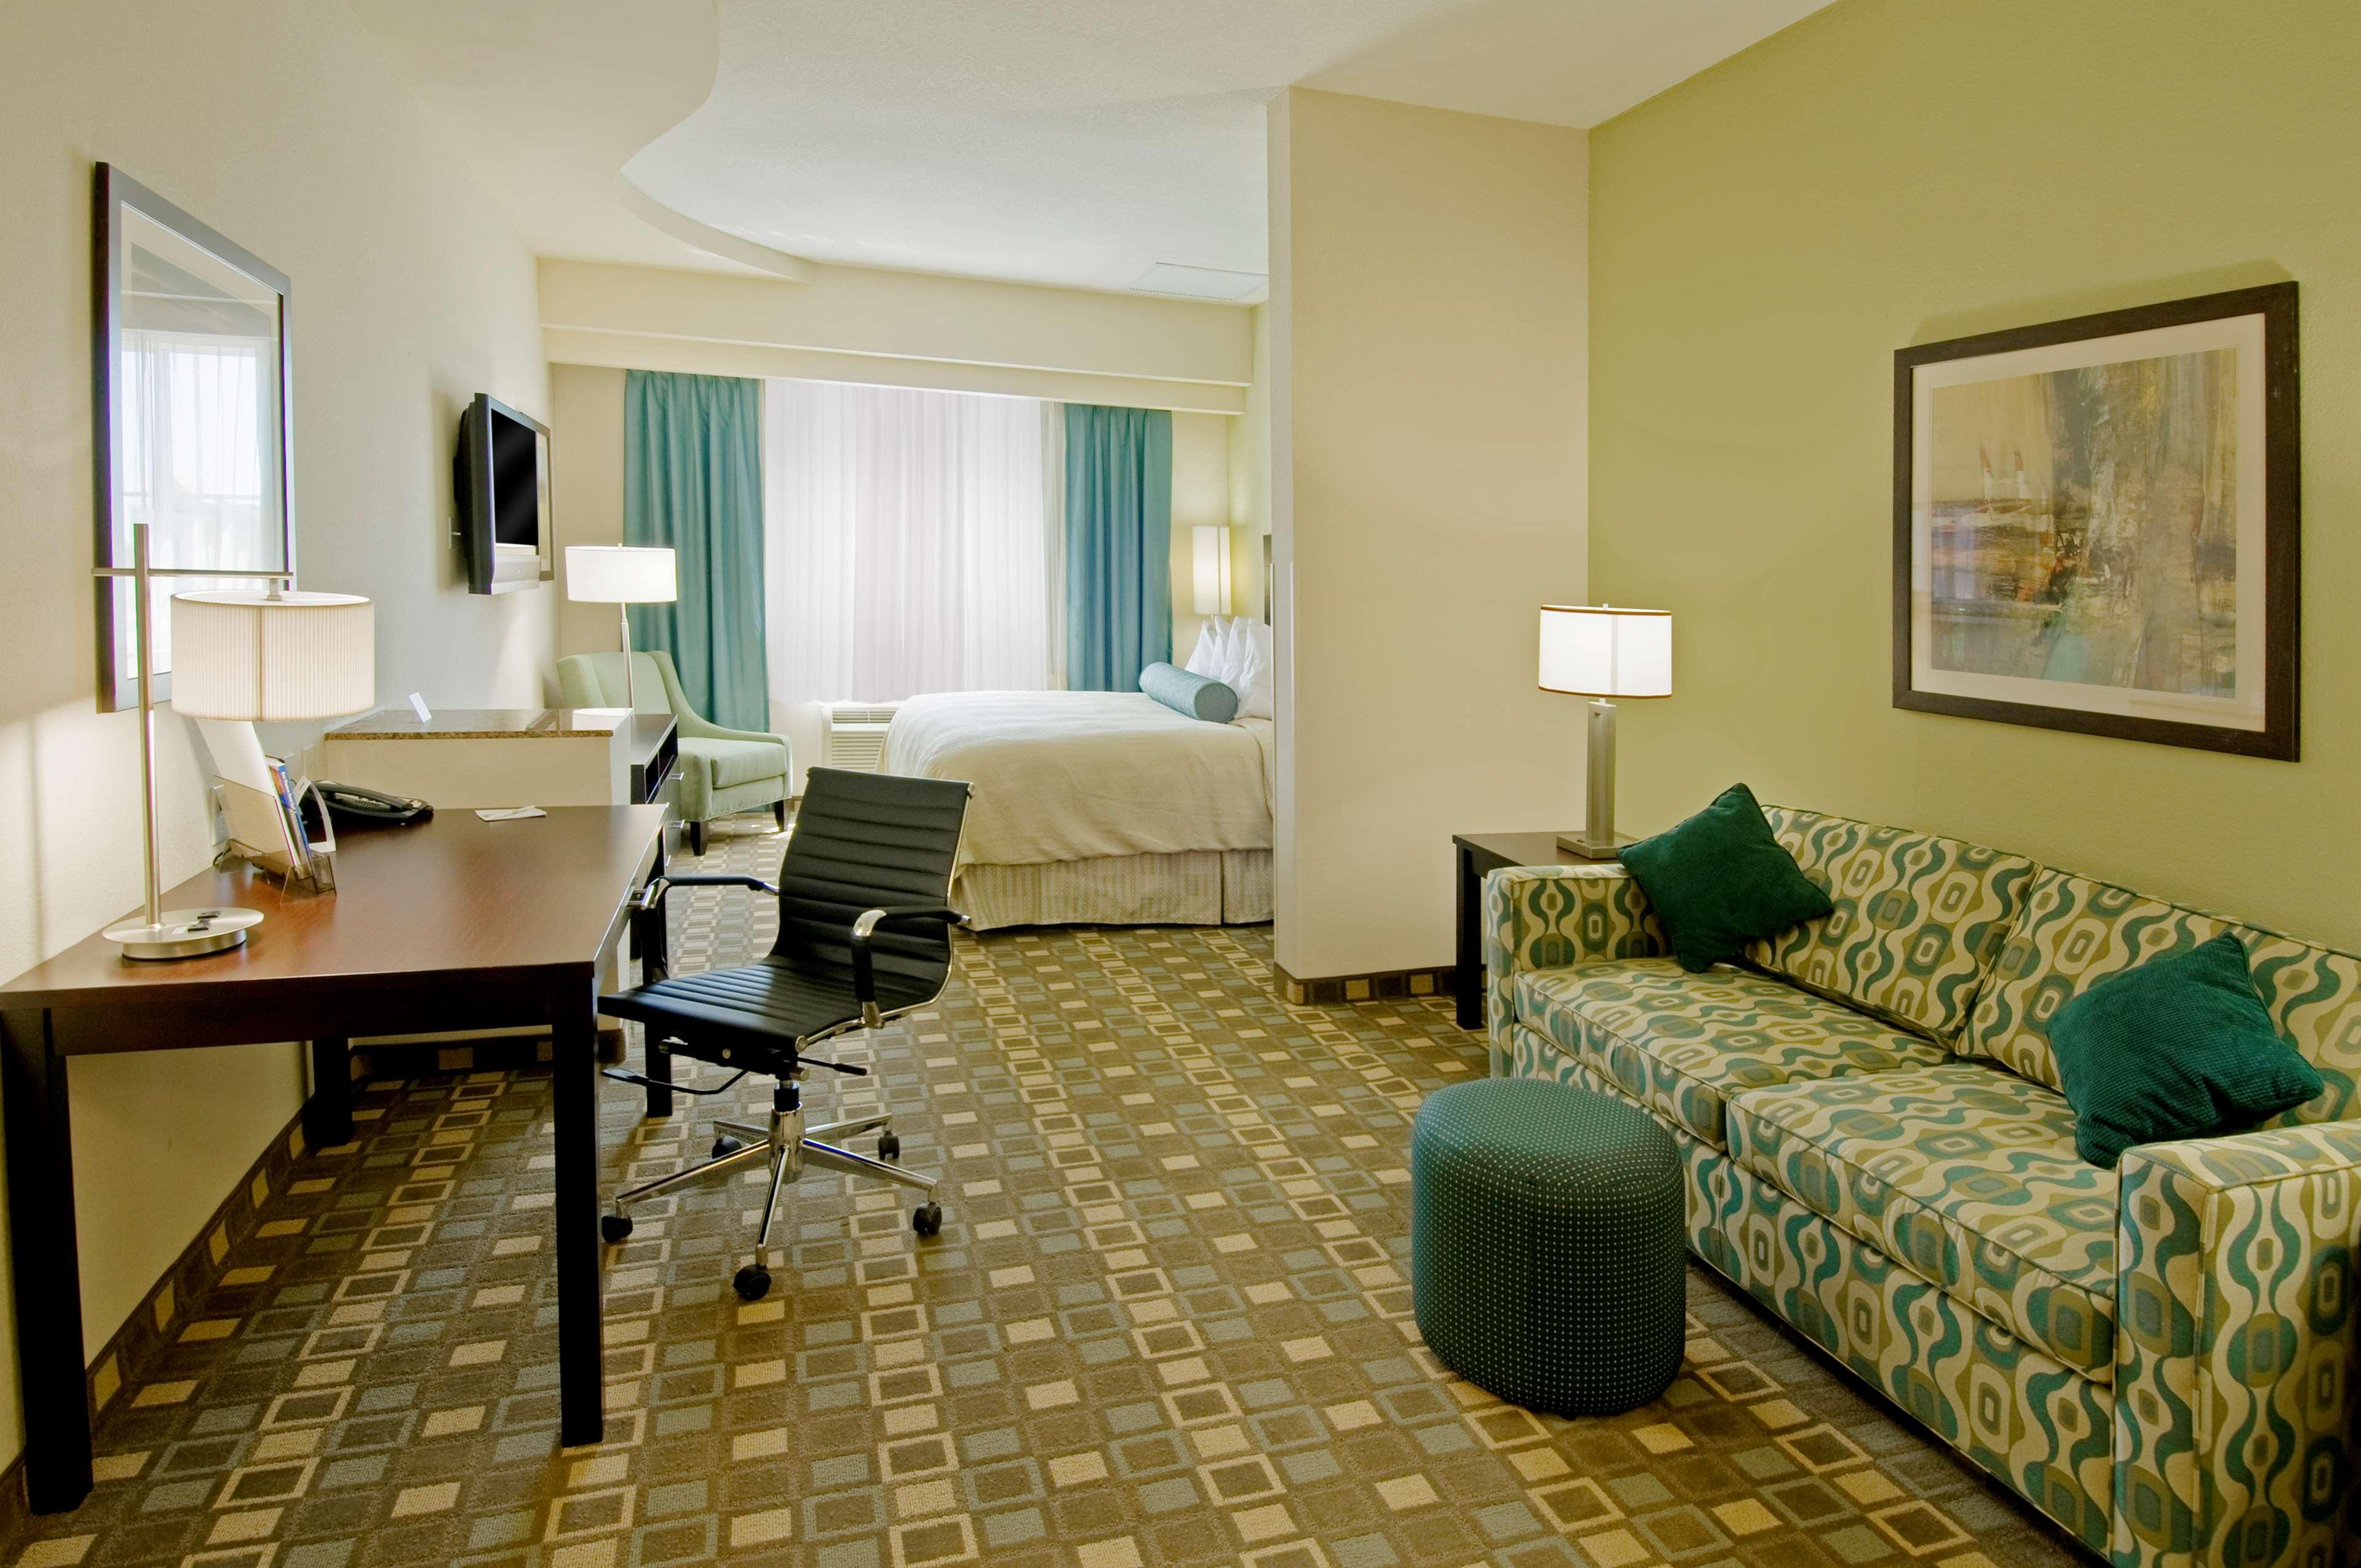 Best Western Plus Fort Lauderdale Airport South Inn & Suites image 11